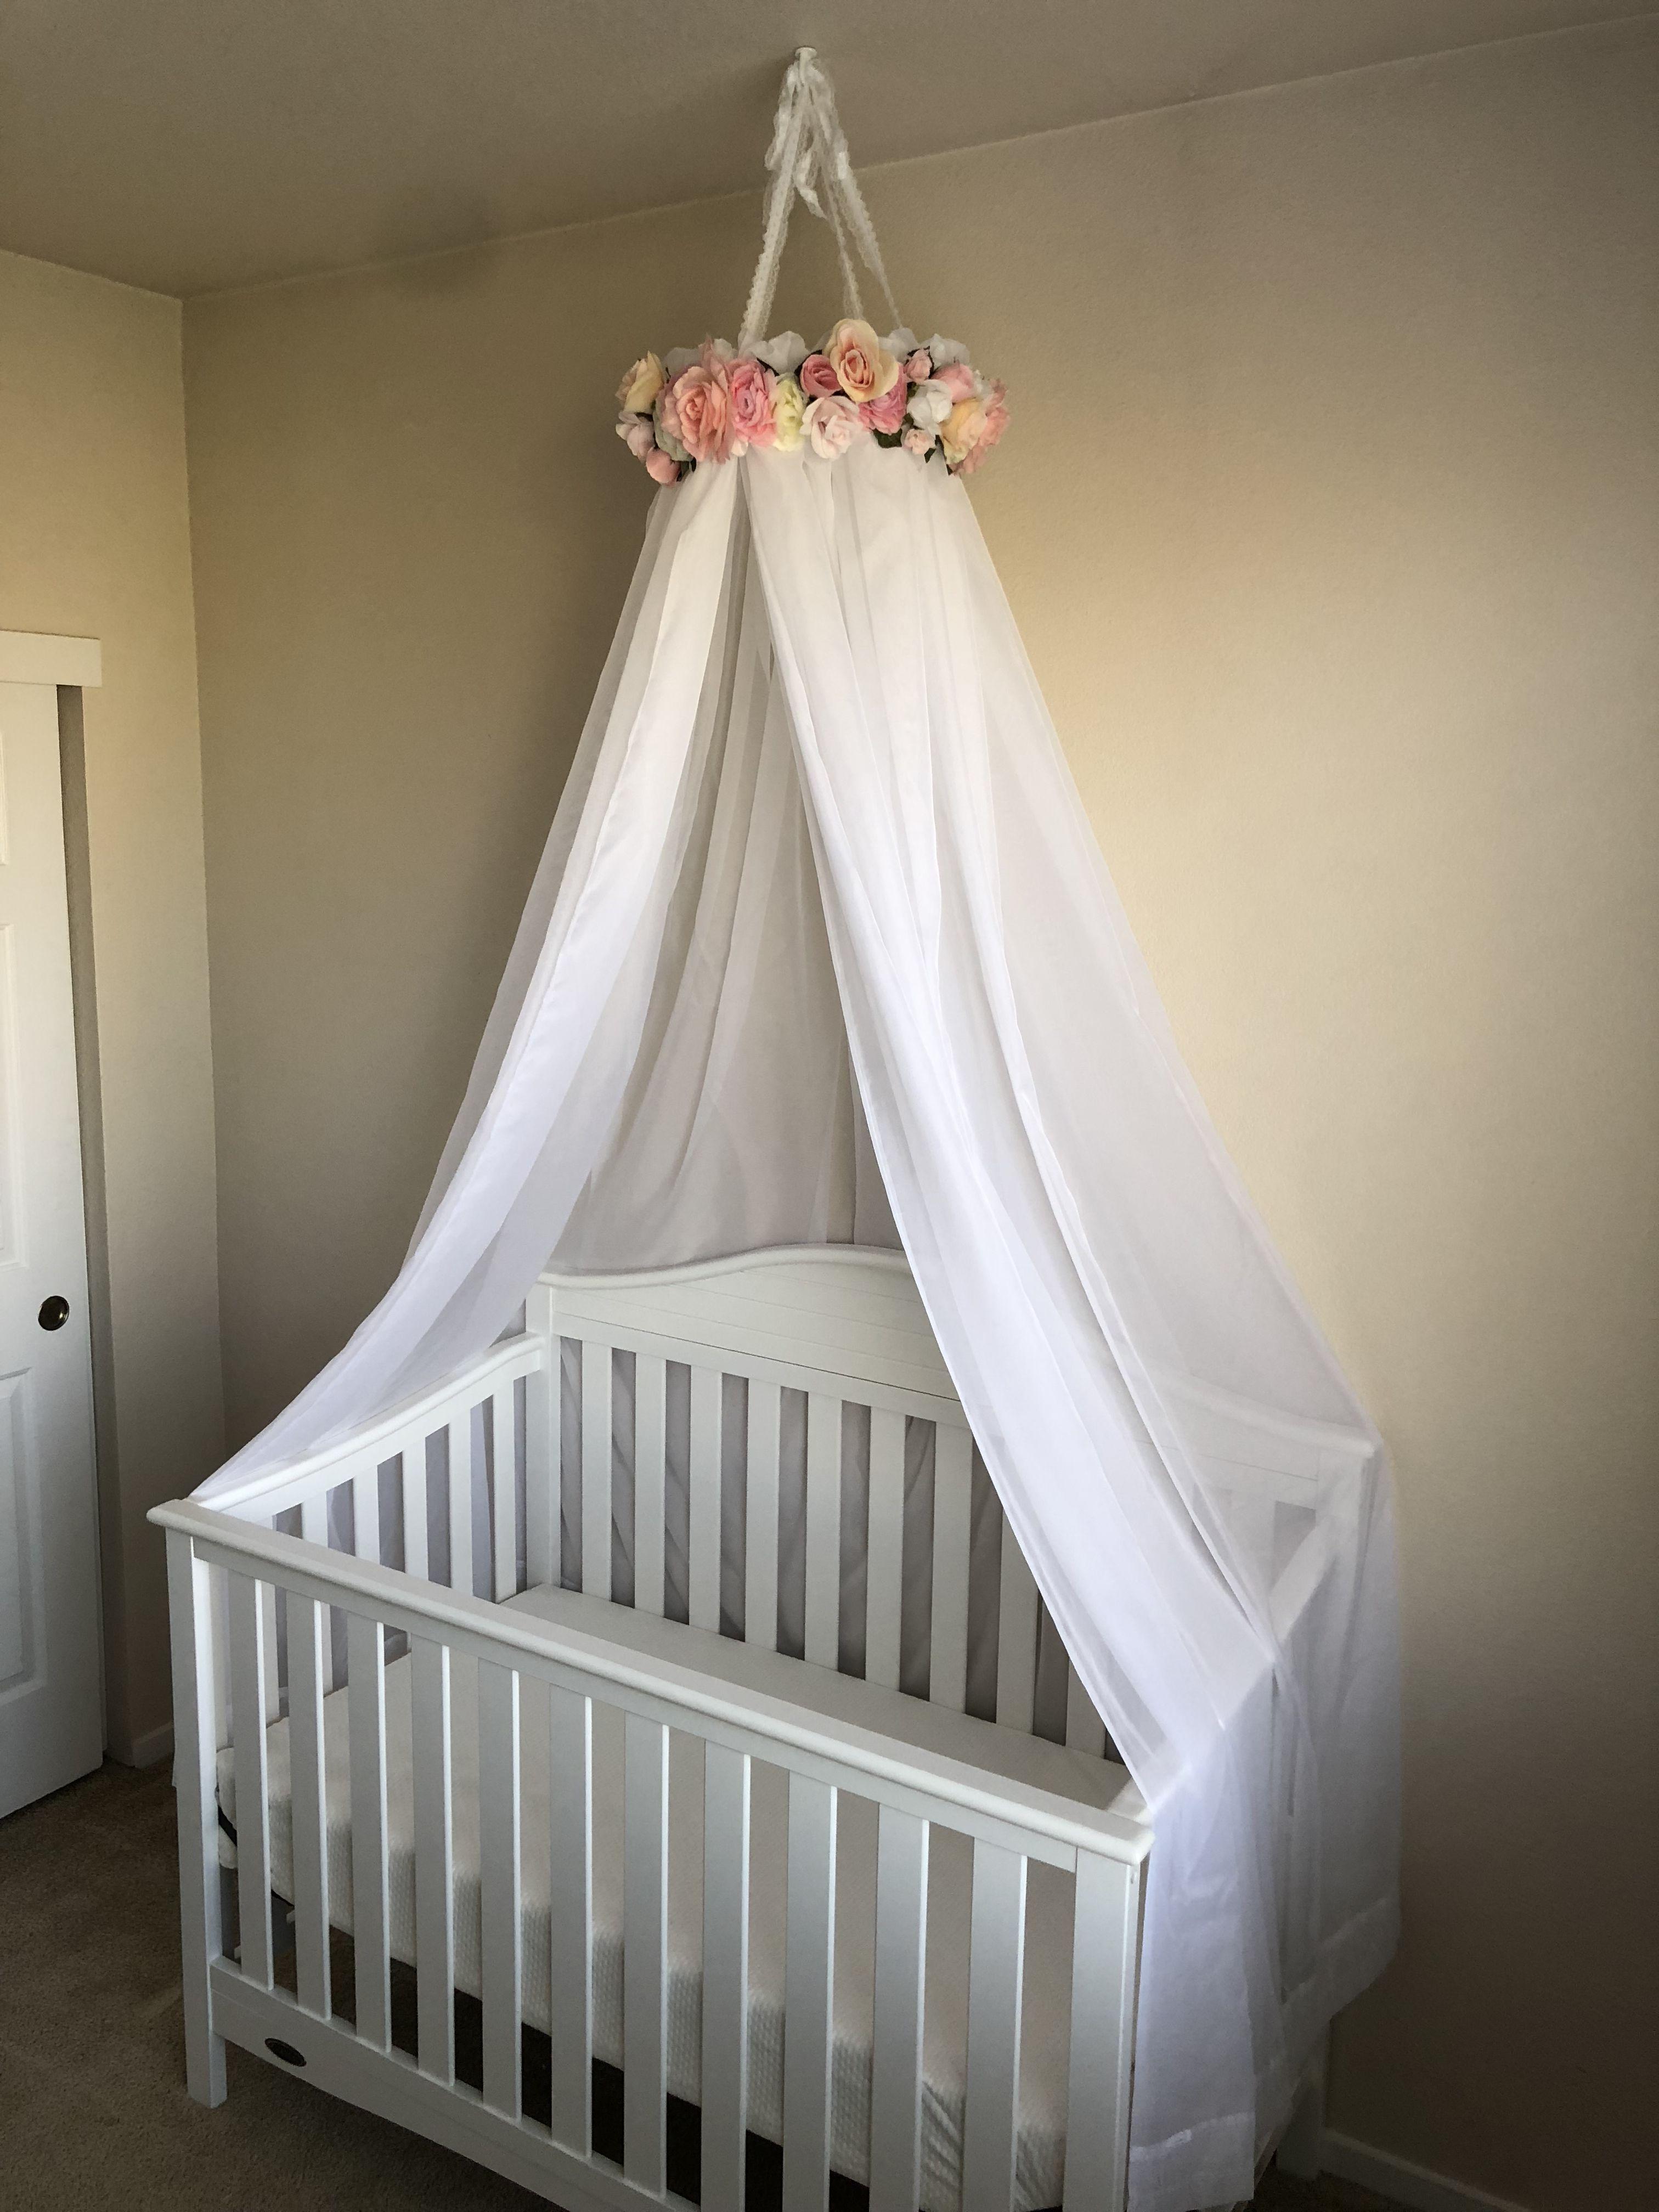 Diy floral crib canopy crib canopy cribs baby room